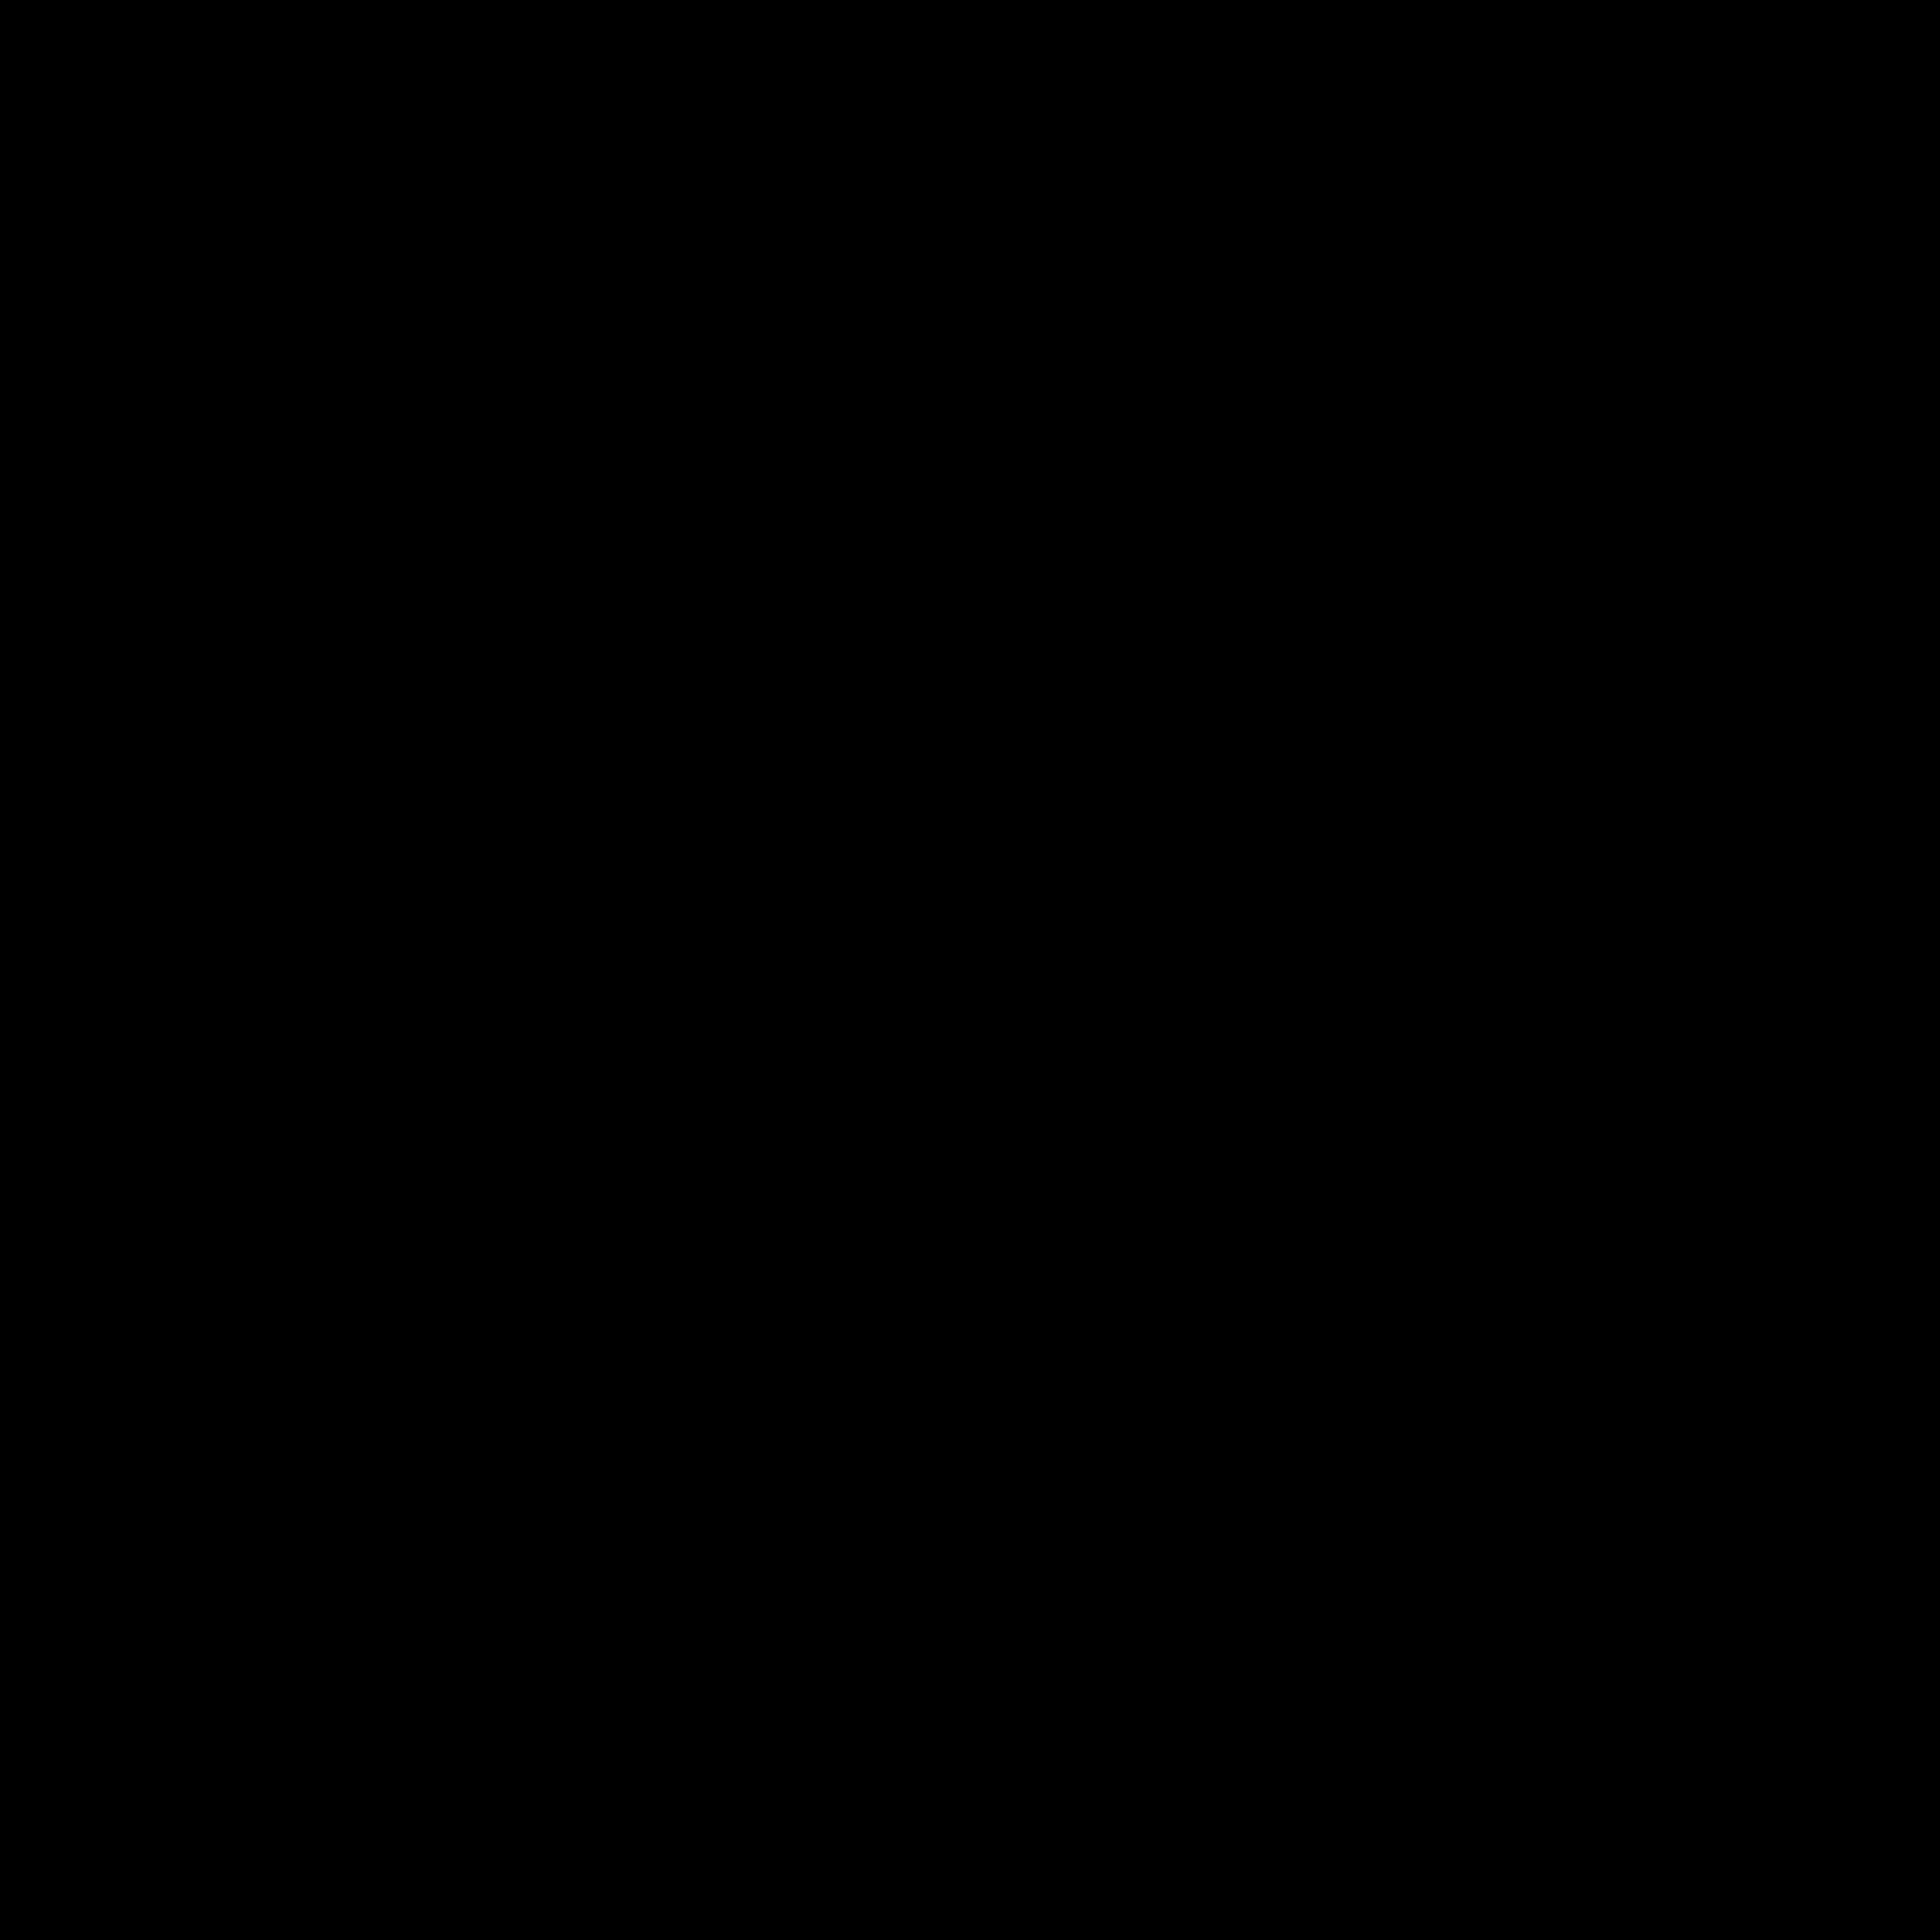 Boris Logo PNG Transparent & SVG Vector.